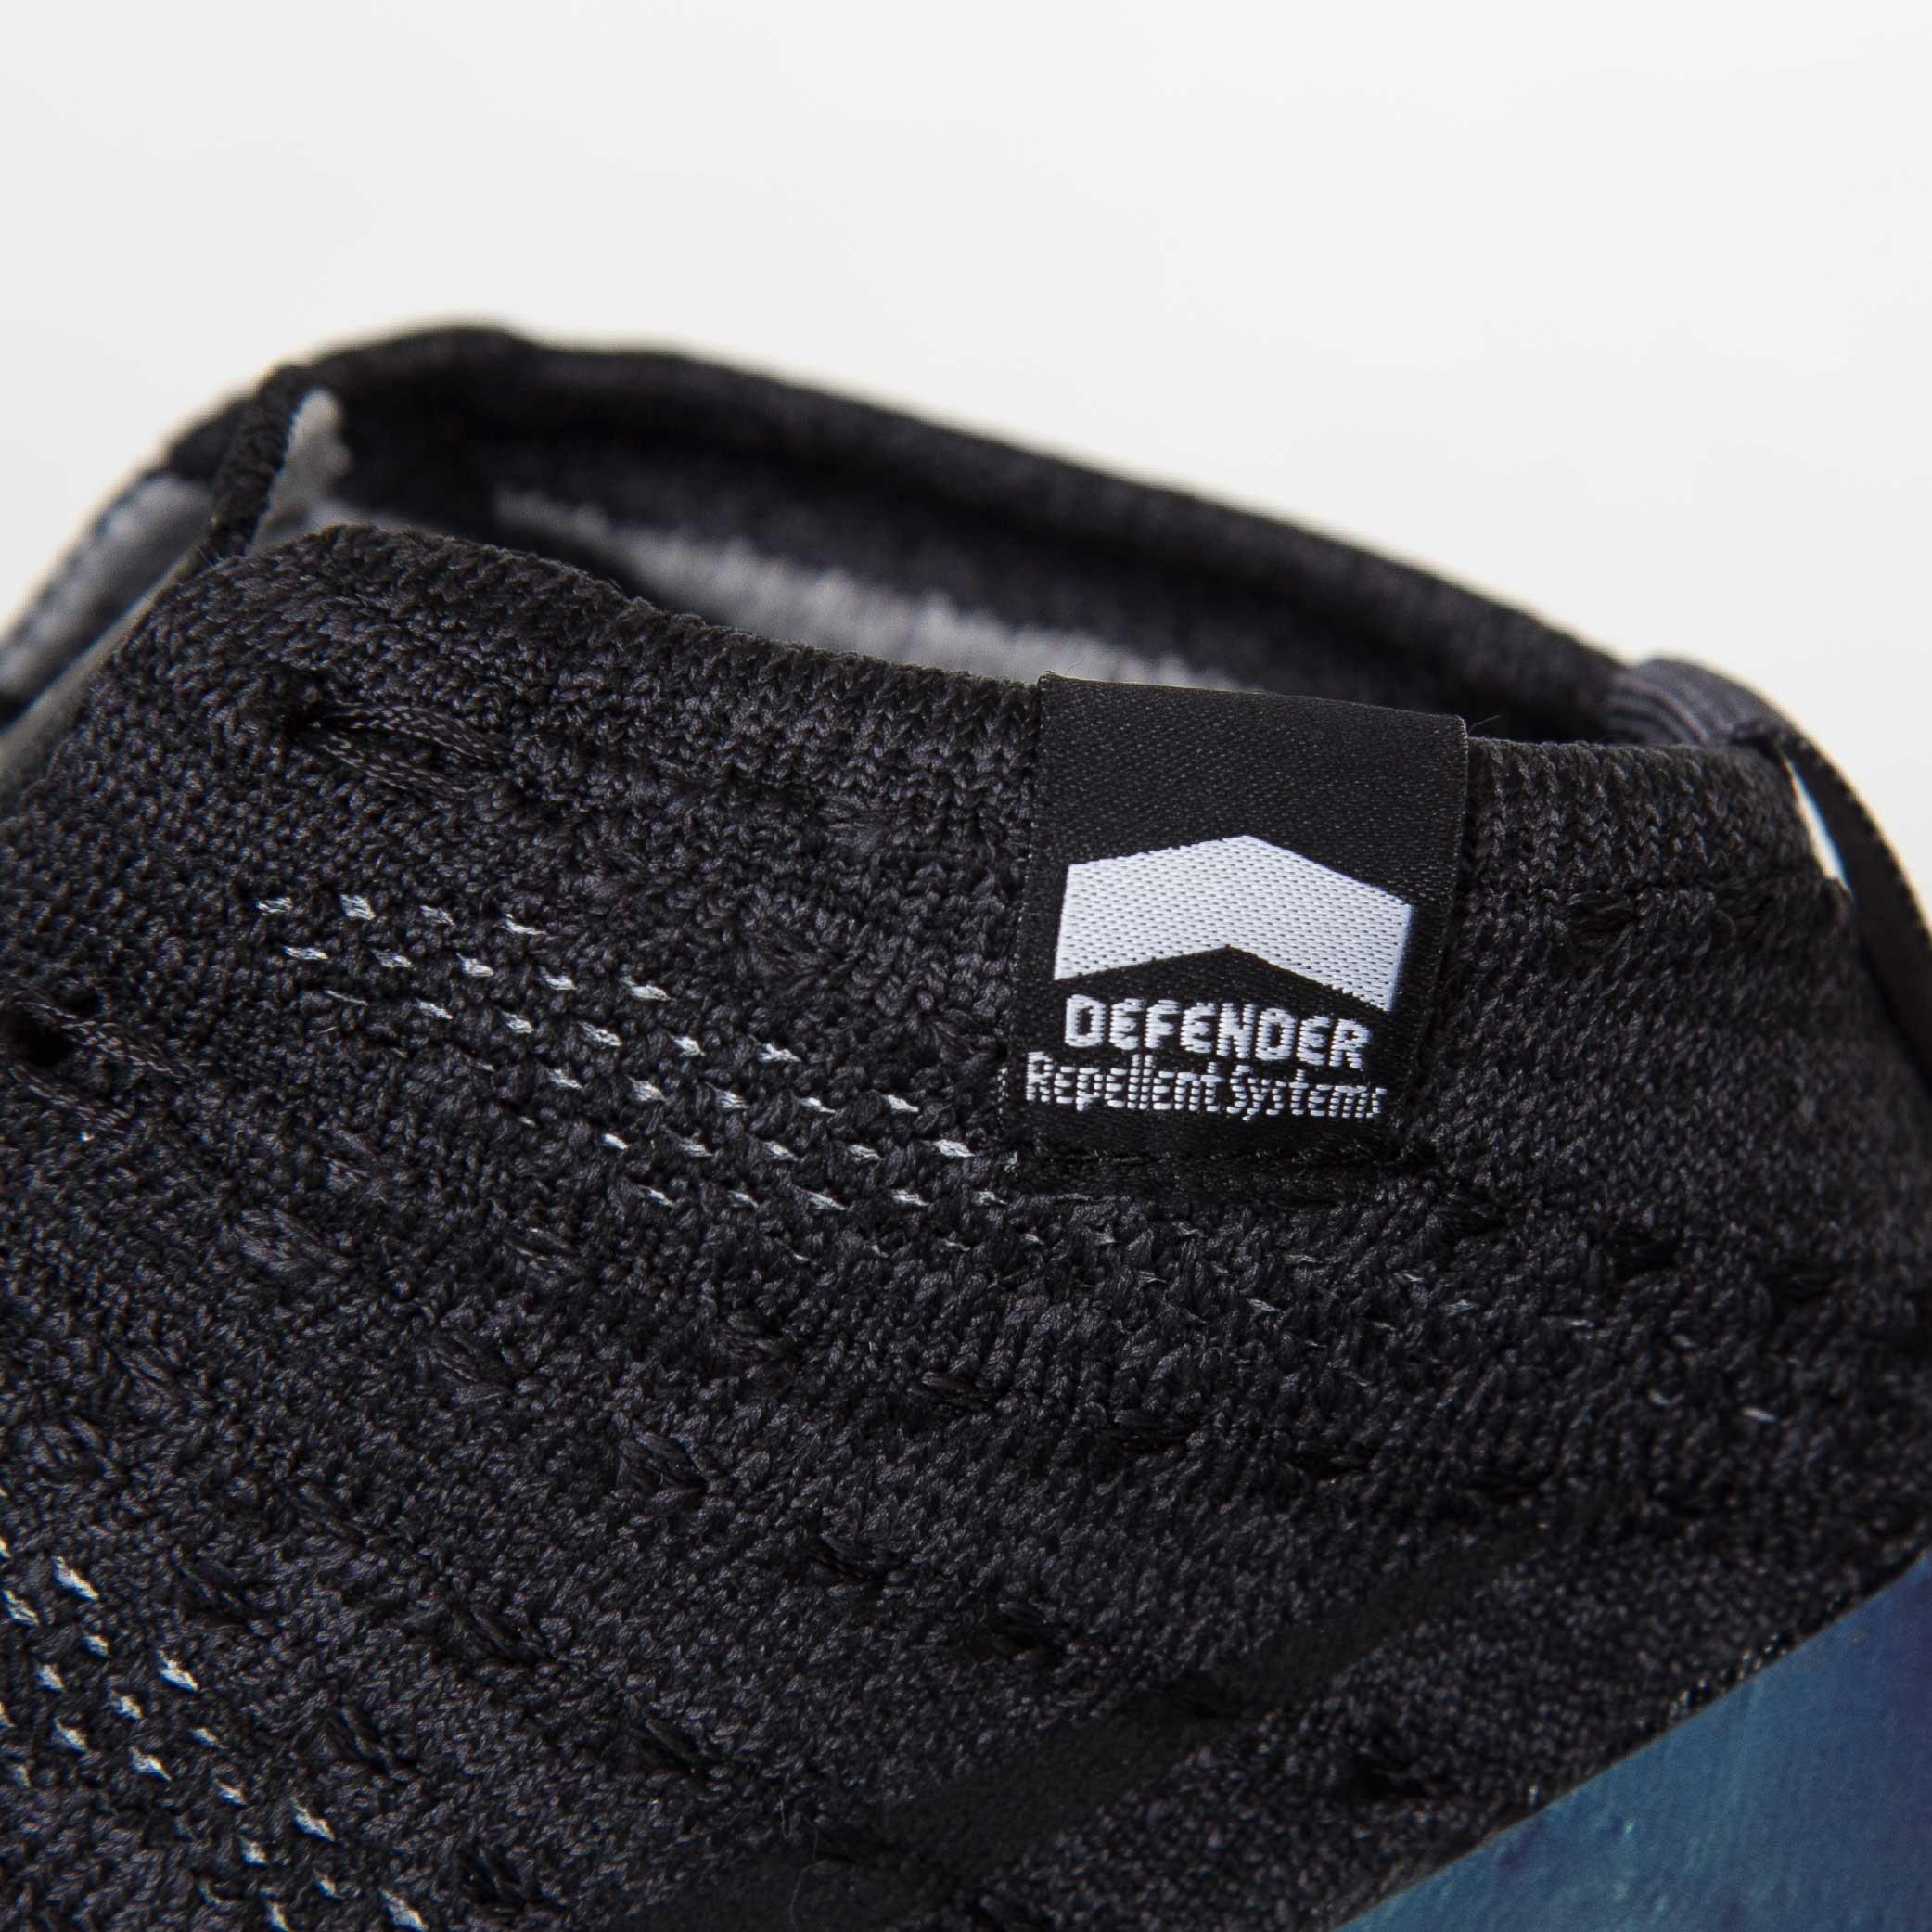 9b9f7bafba837 Nike Wmns Flyknit Trainer Chukka Sneakerboot - 805093-001 - Sneakersnstuff